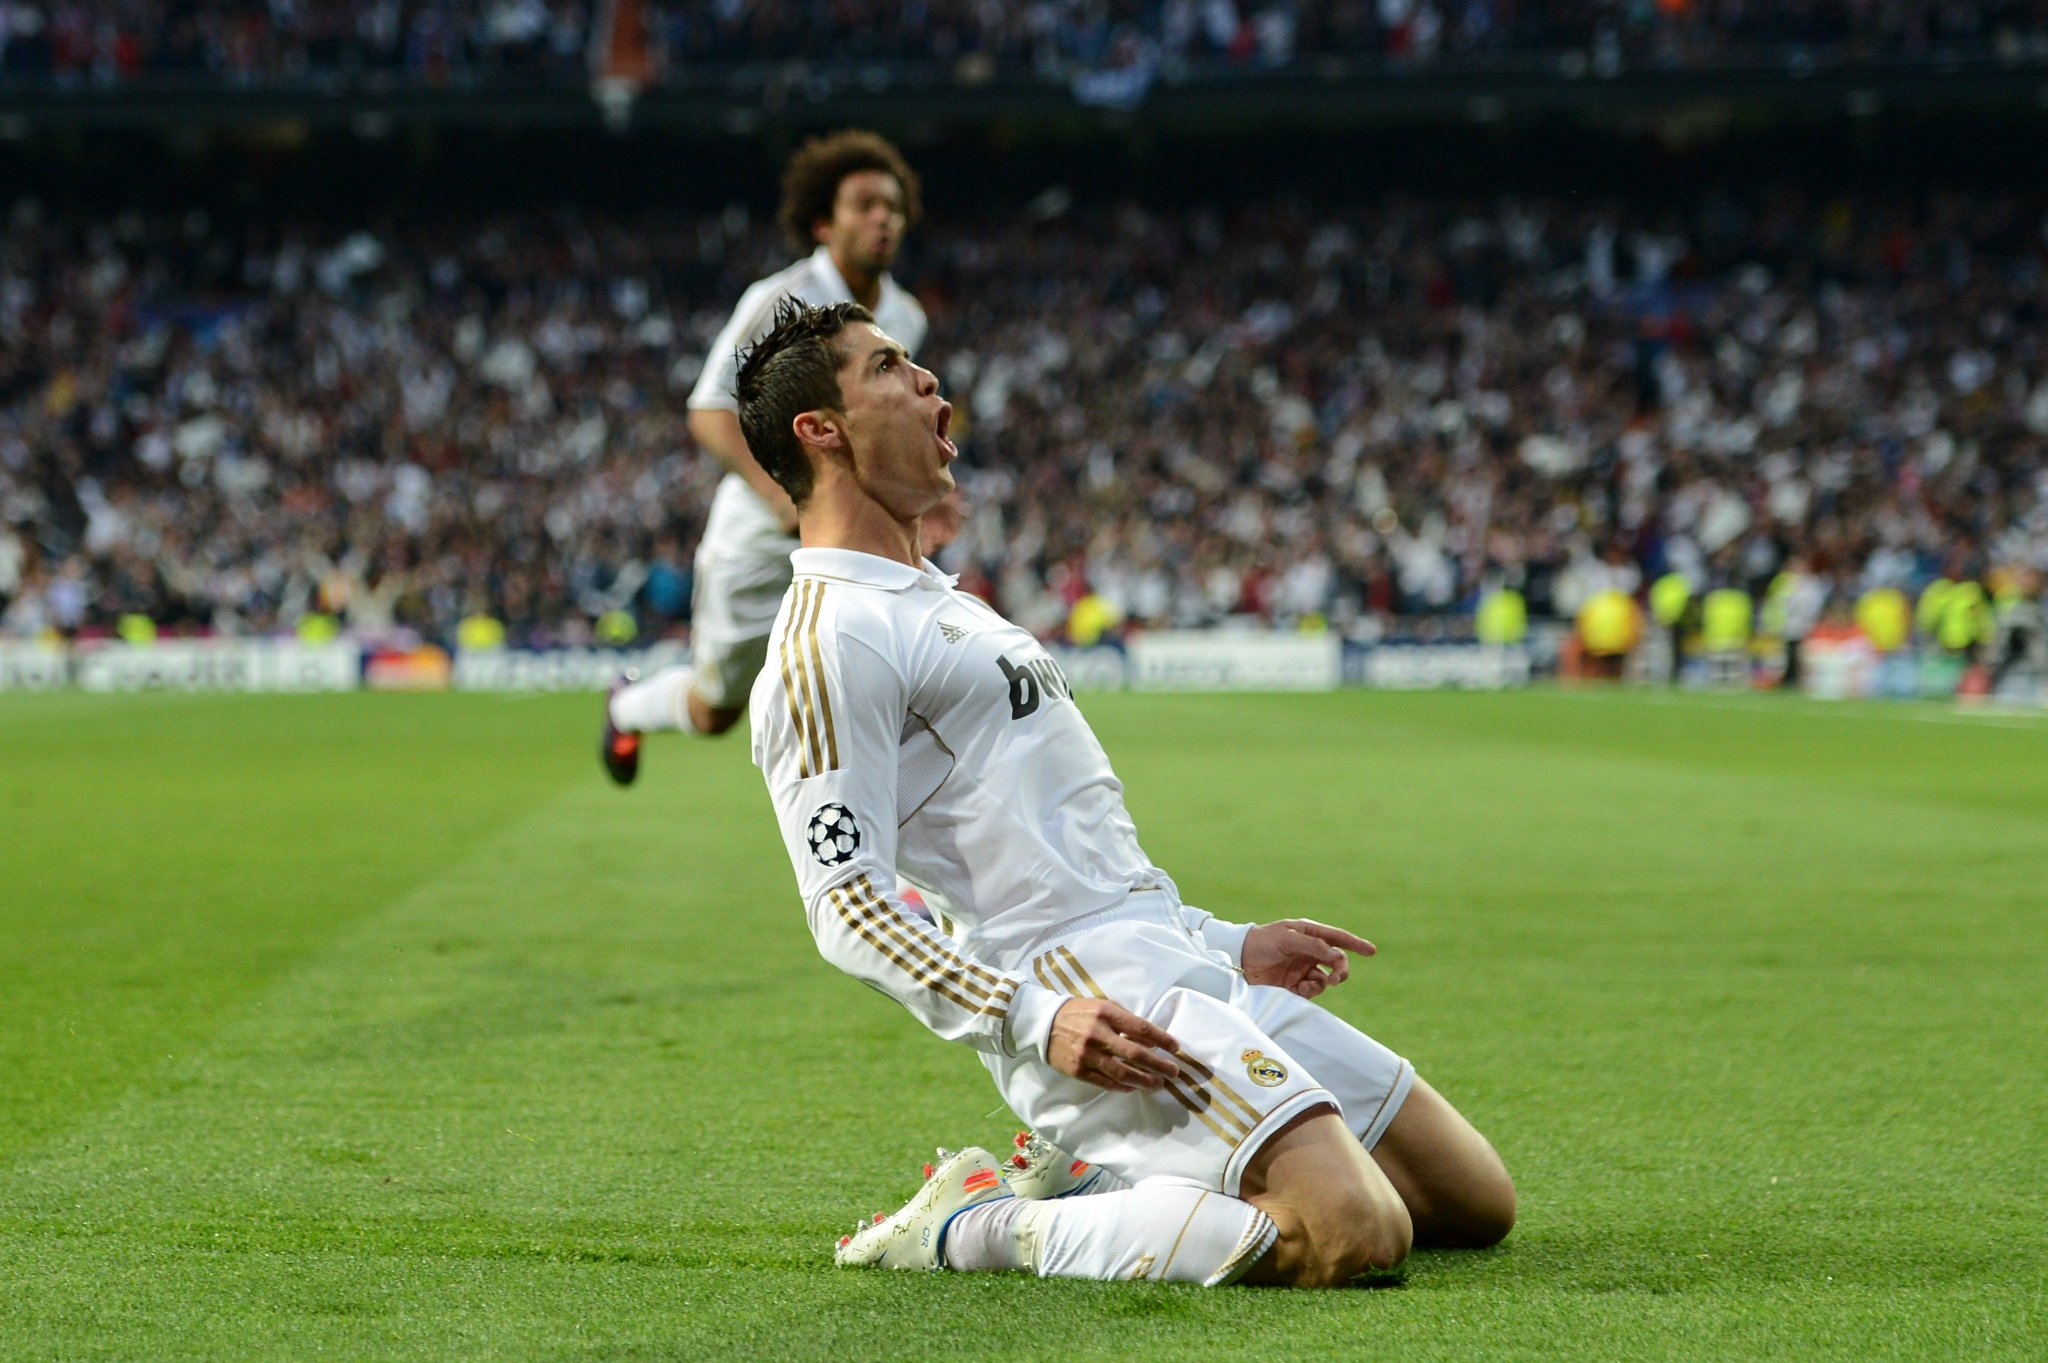 Cristiano Ronaldo v Bayern ��   �� GAMES �� 6⃣ ⚽️ GOALS  �� 9⃣  How many tonight? ��  #UCL https://t.co/pqYhiDWiTW